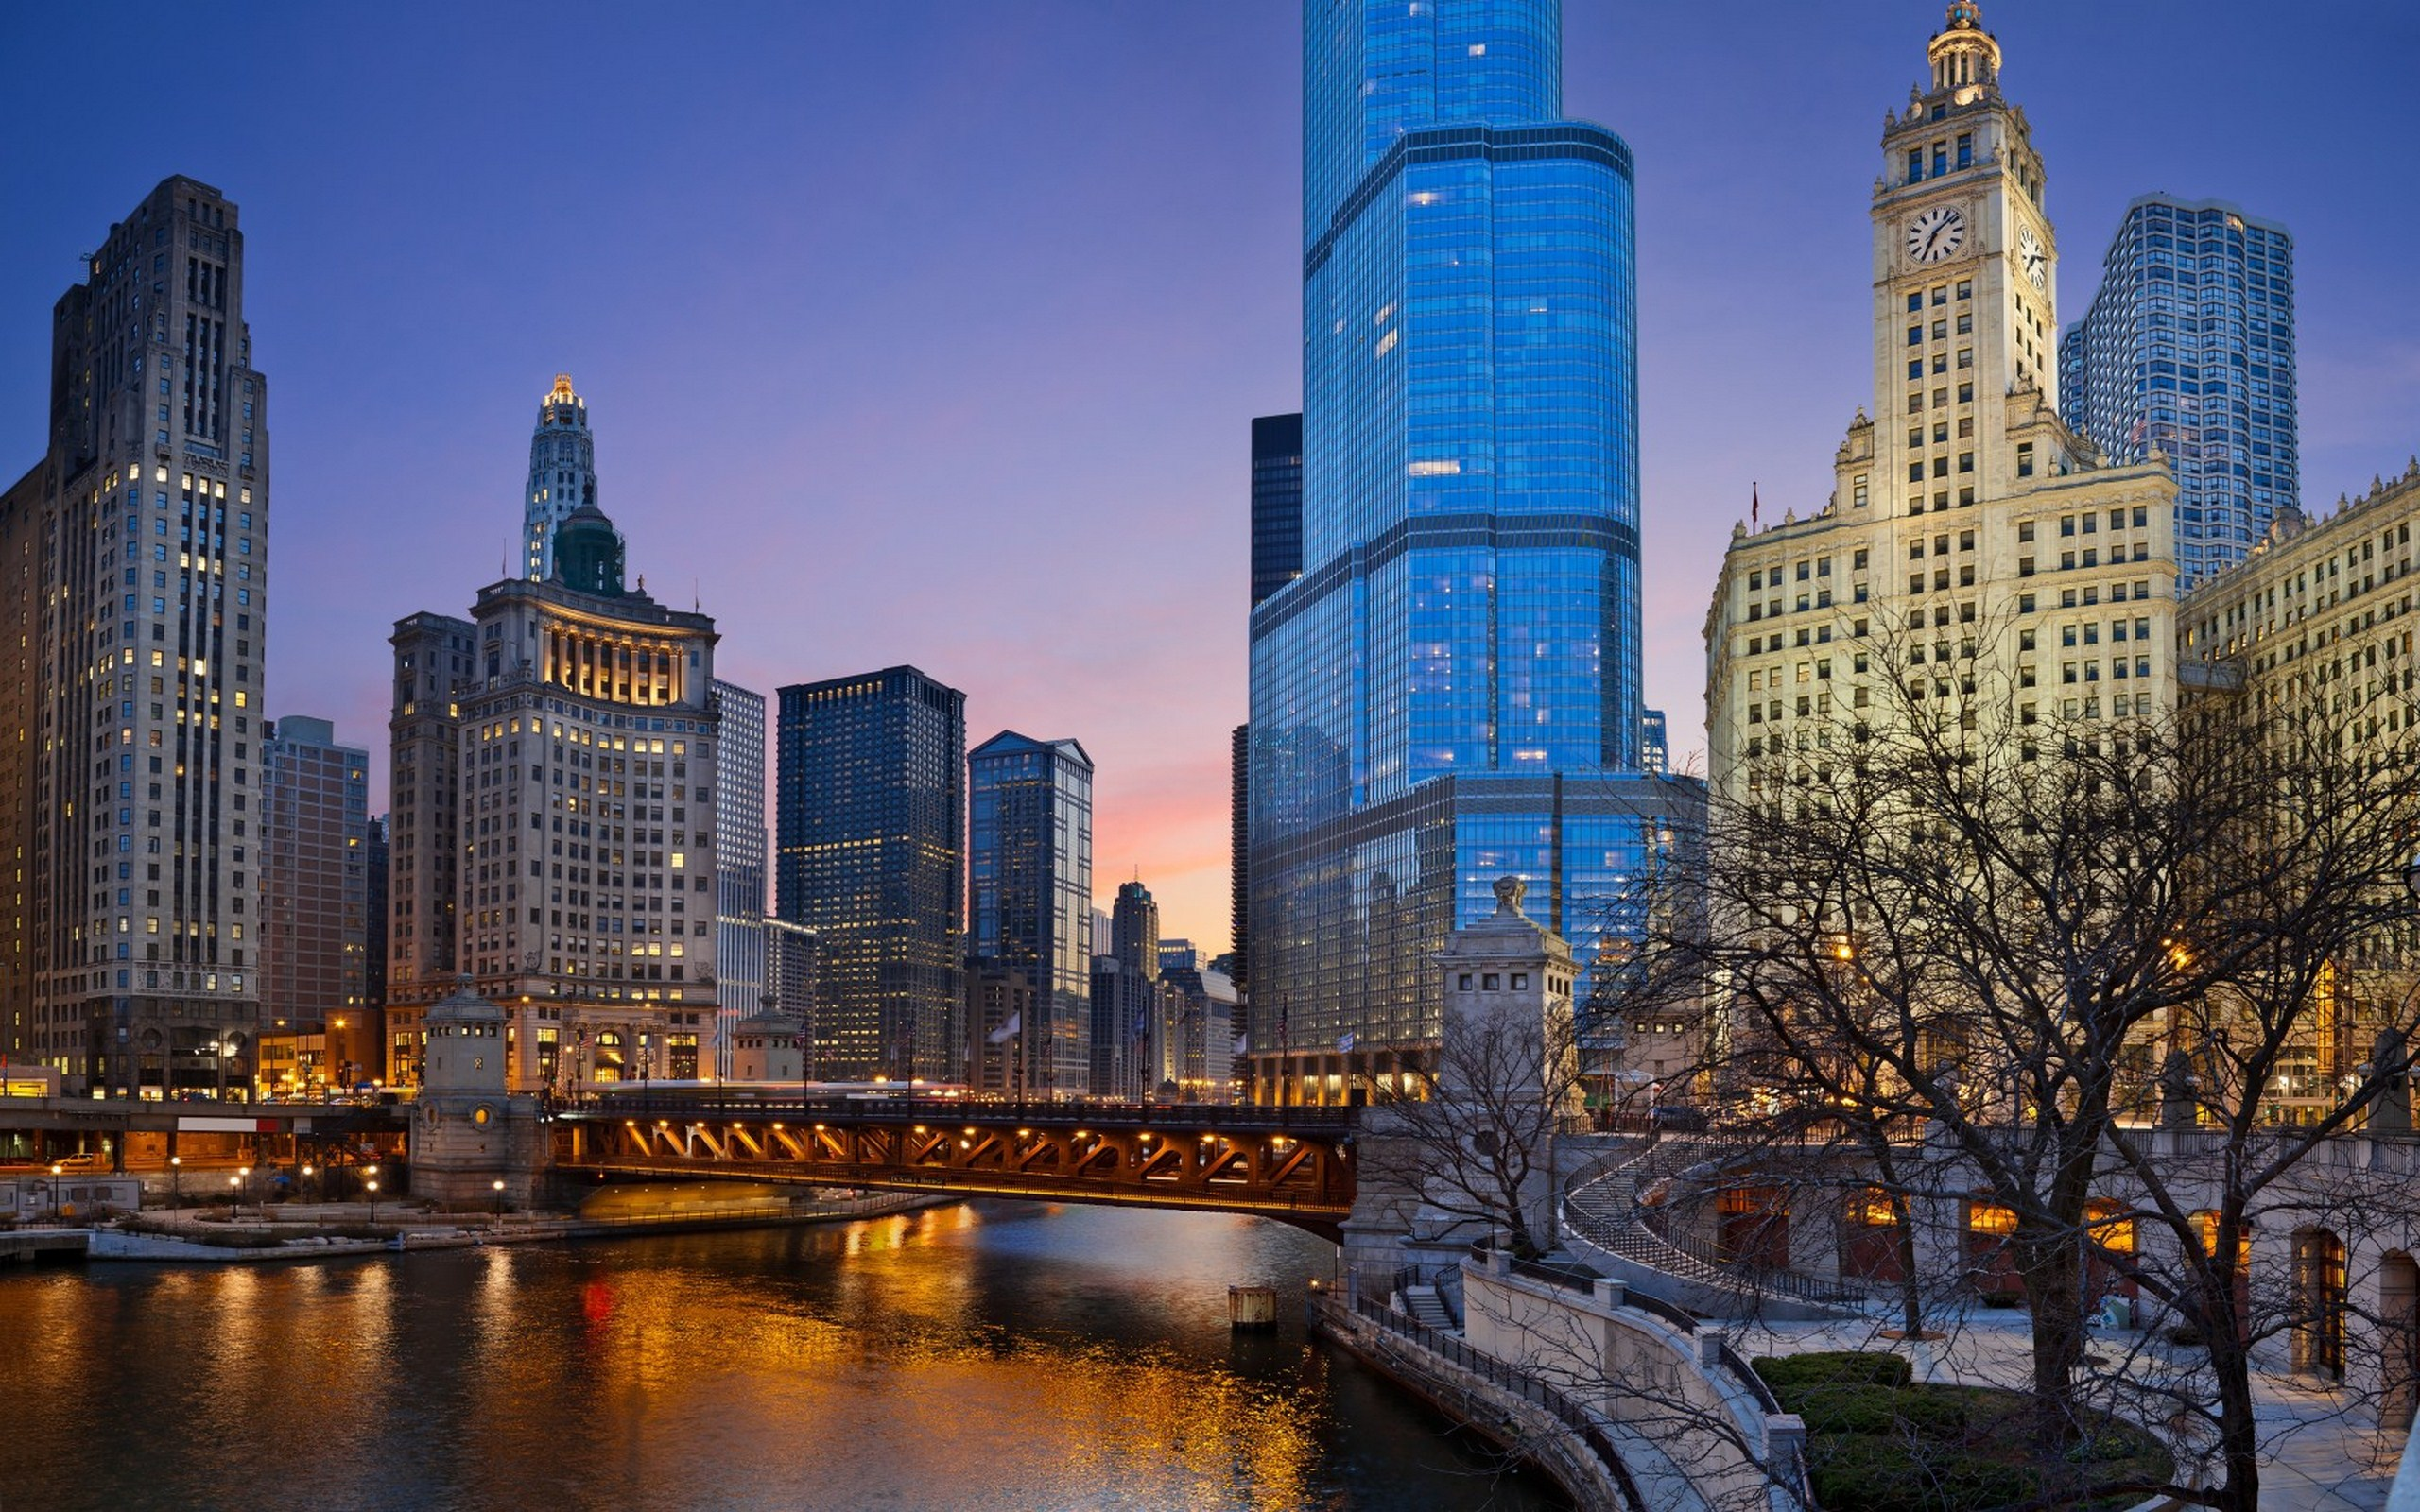 Chicago Computer Wallpaper